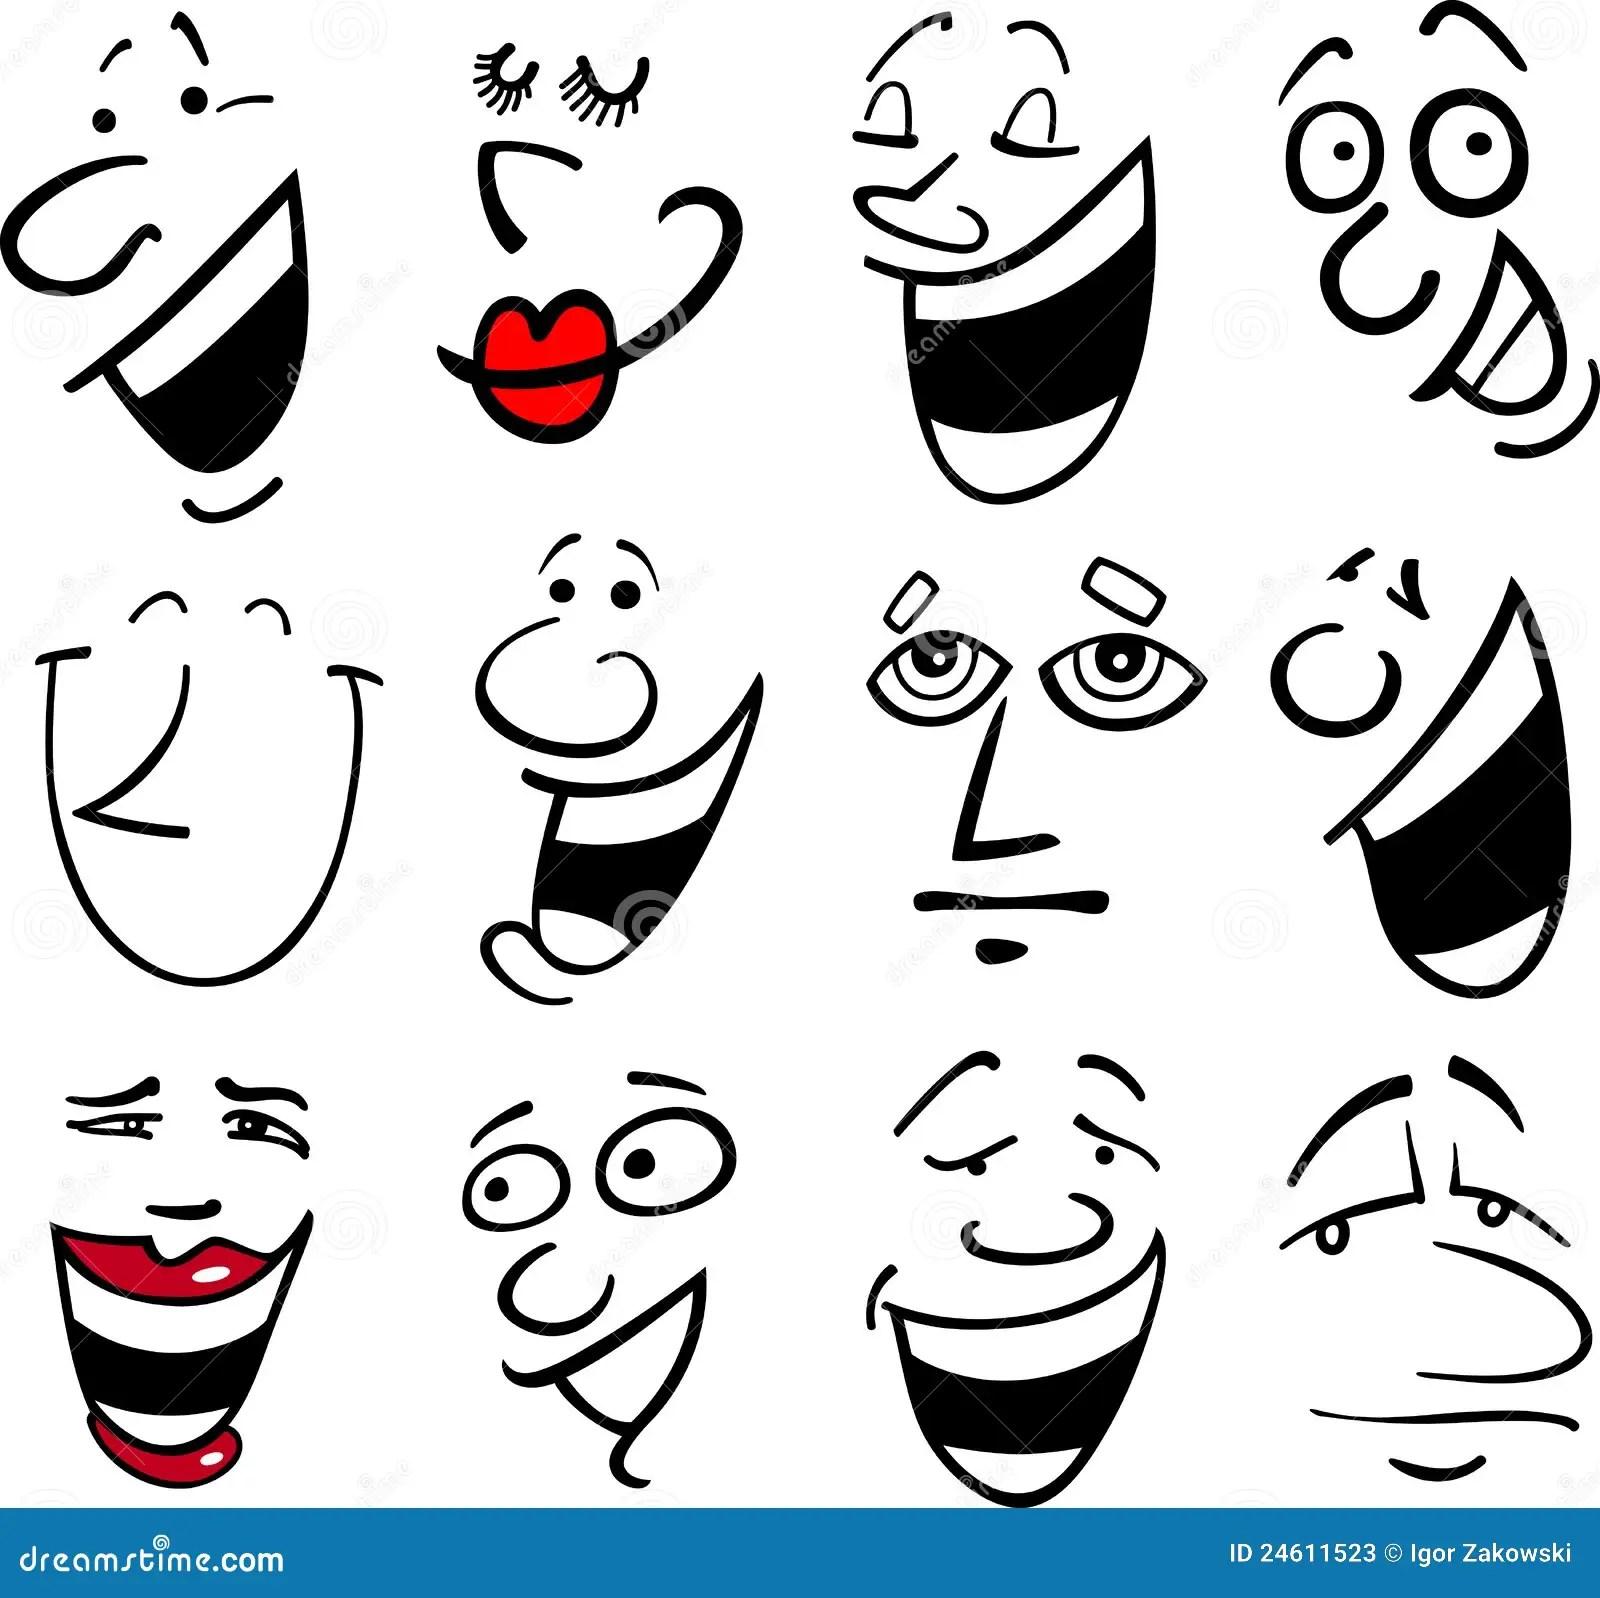 Cartoon Emotions Illustration Stock Photos